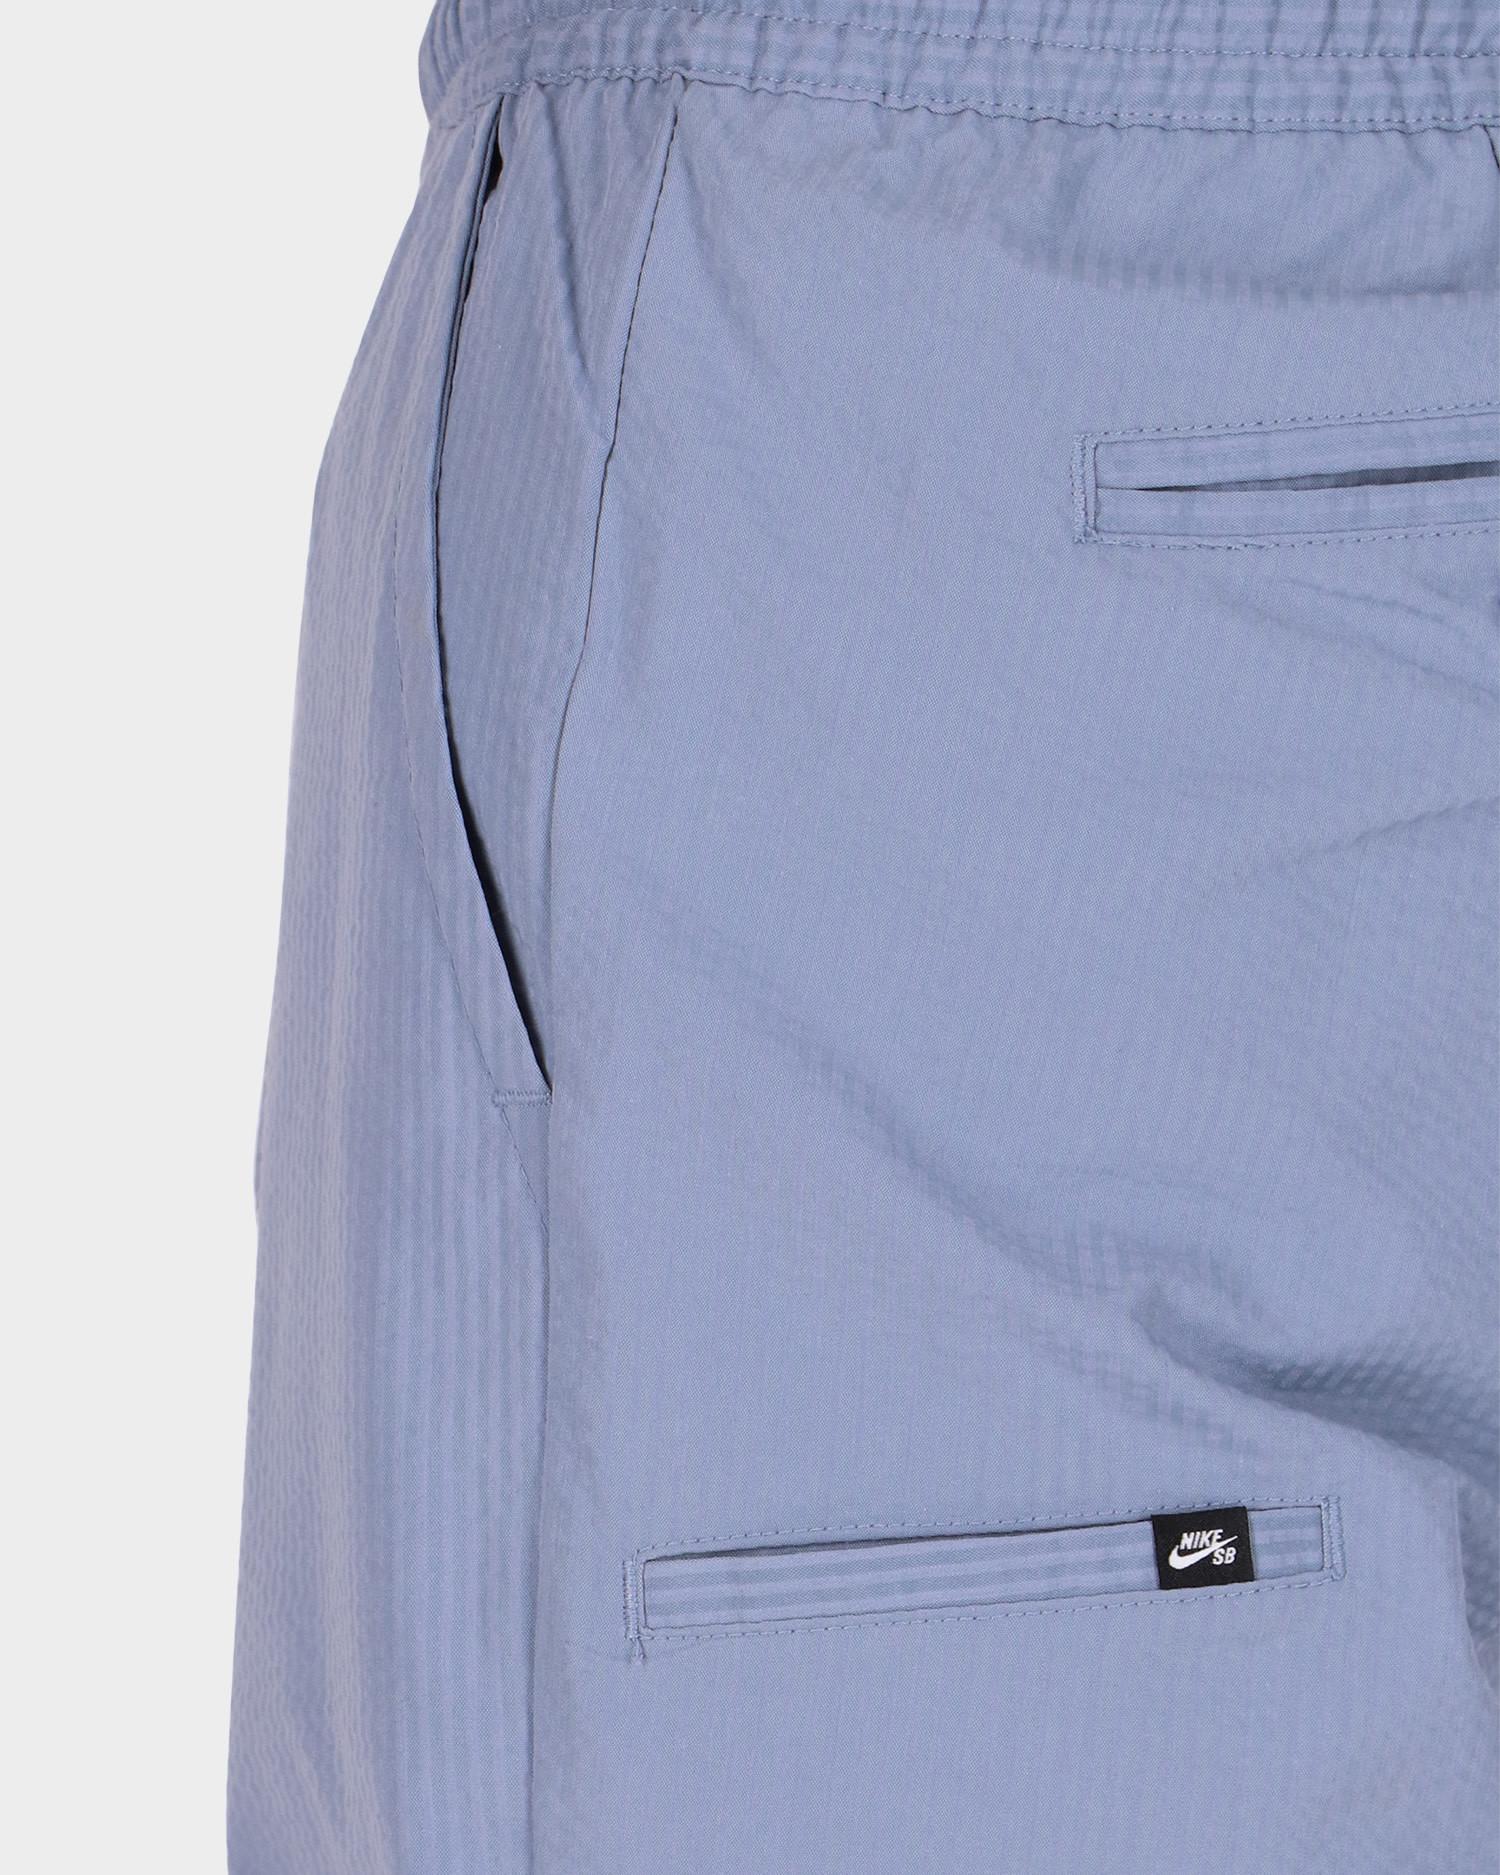 Nike SB Pull-On Skate Chino Pants Ashen Slate